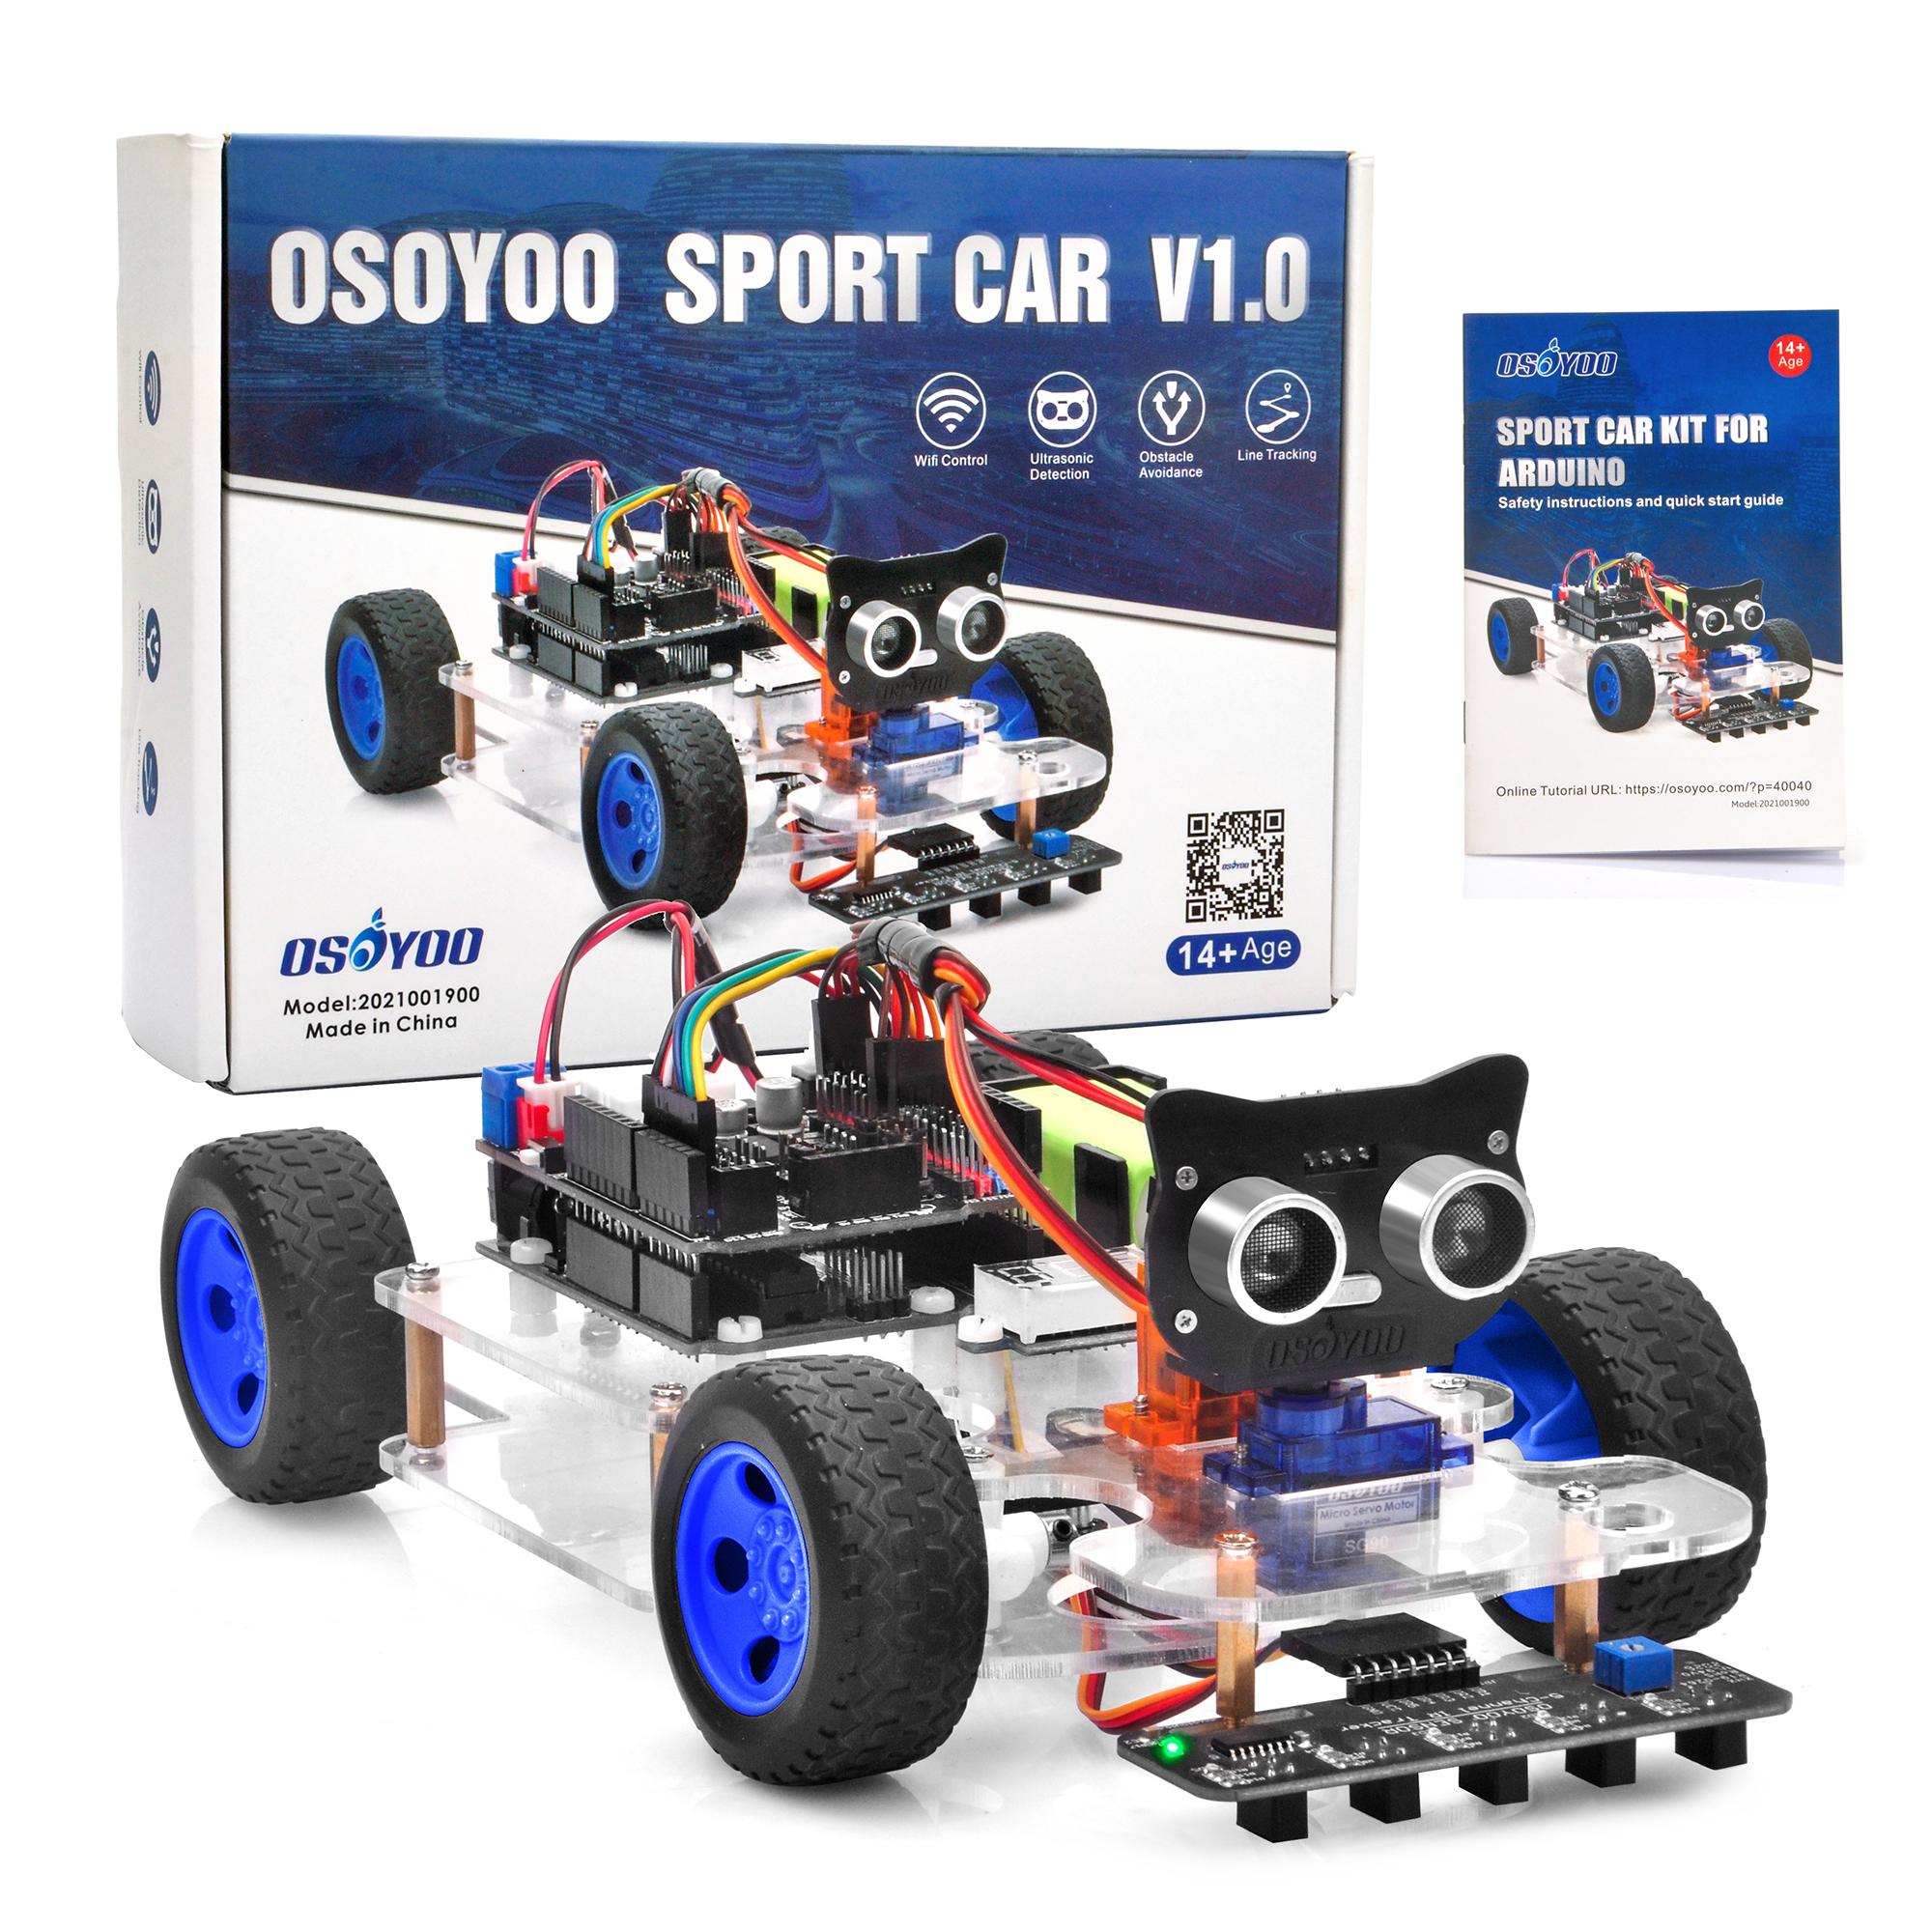 OSOYOO Sport Car for Arduino - Manual